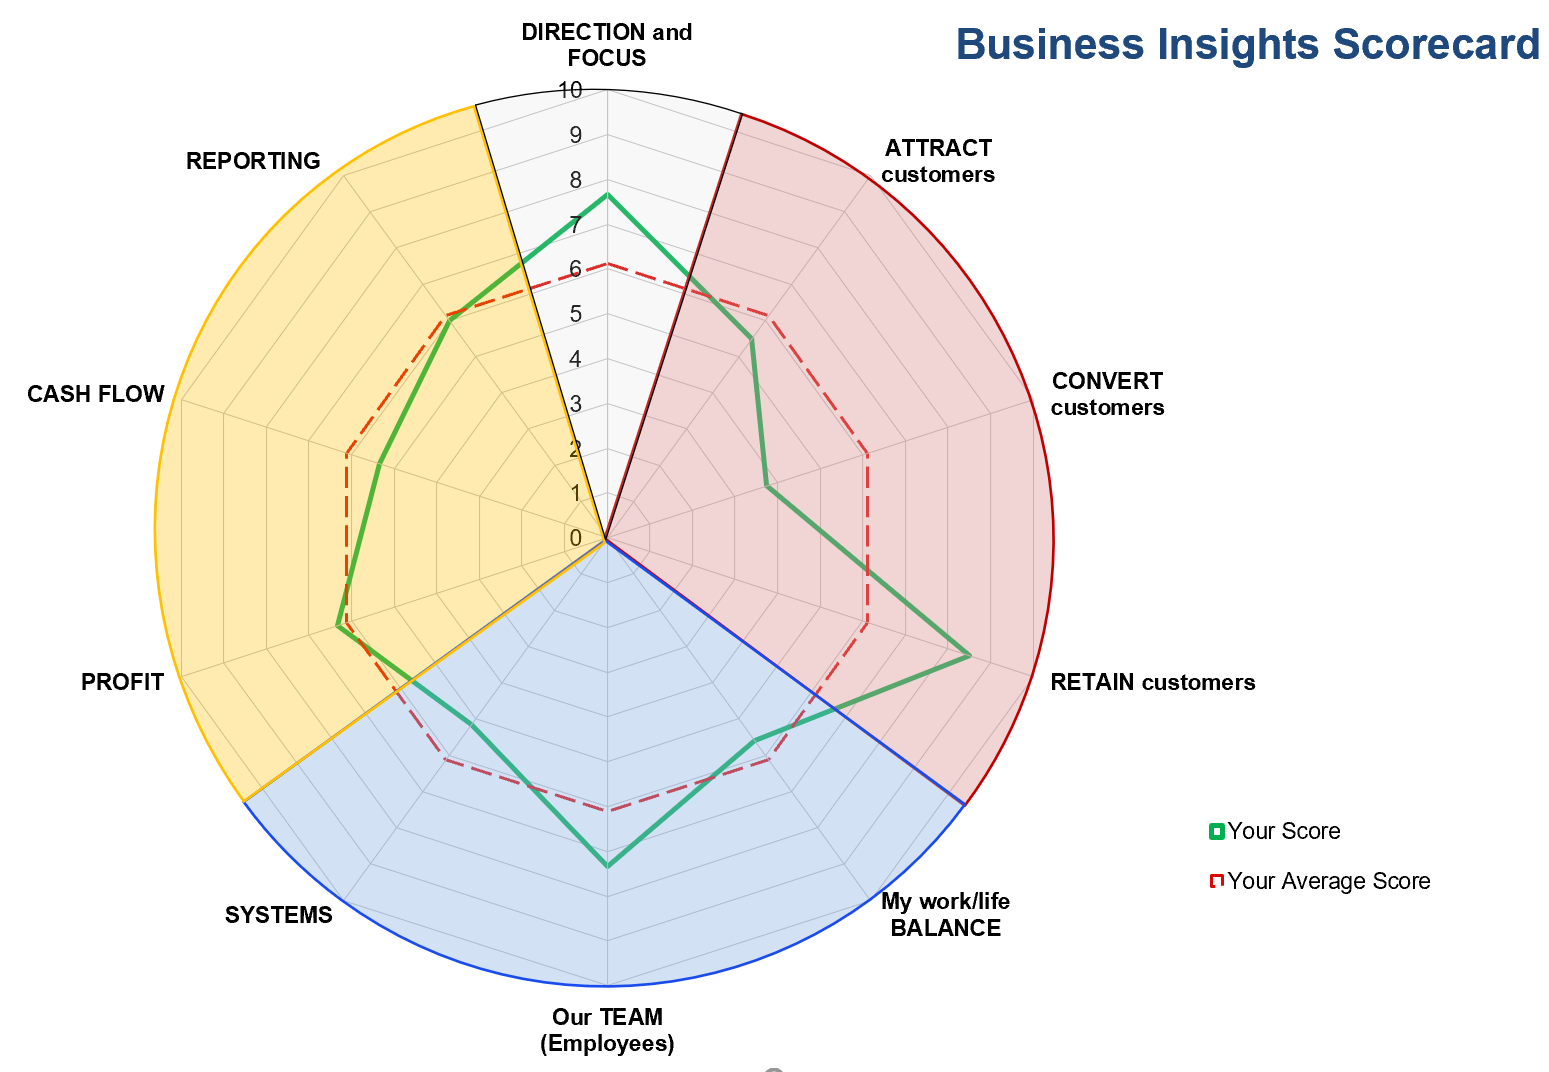 Business Insights Scorecard - Star